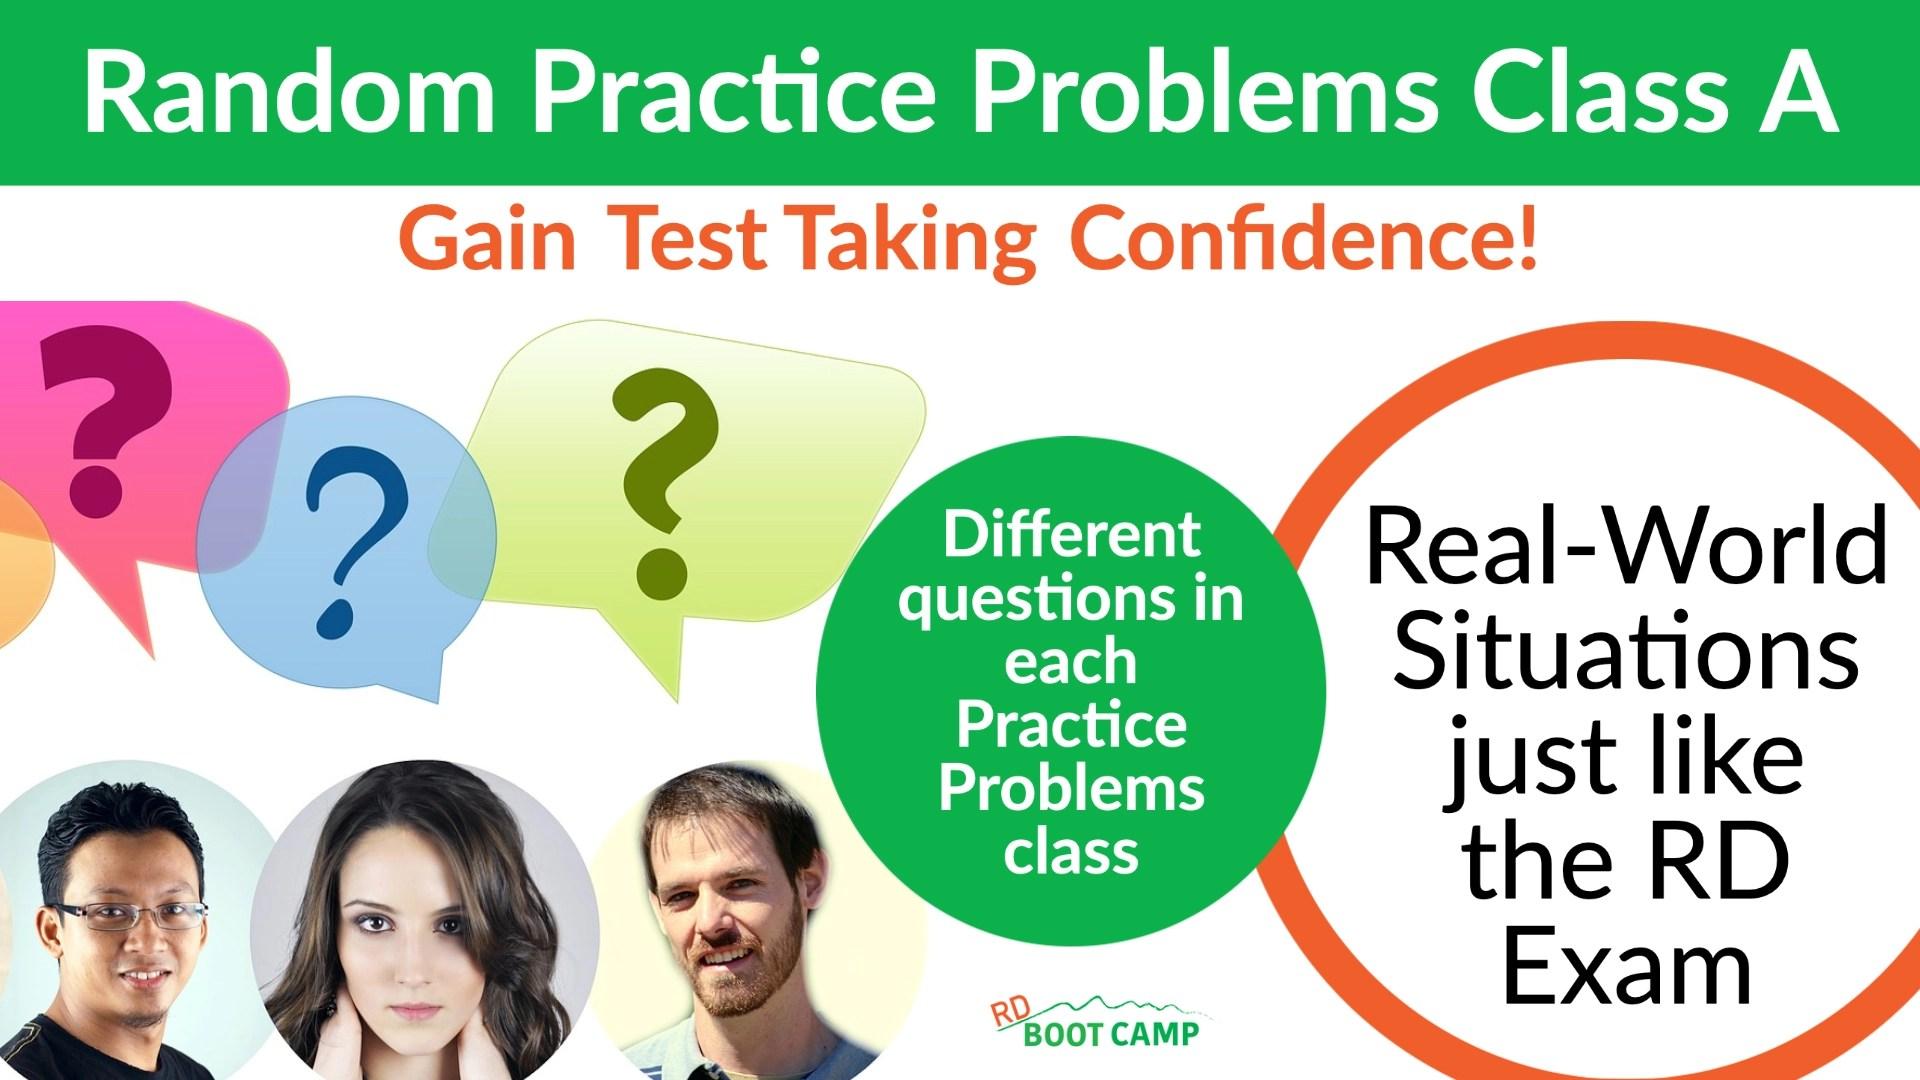 Random Practice Problems Class header